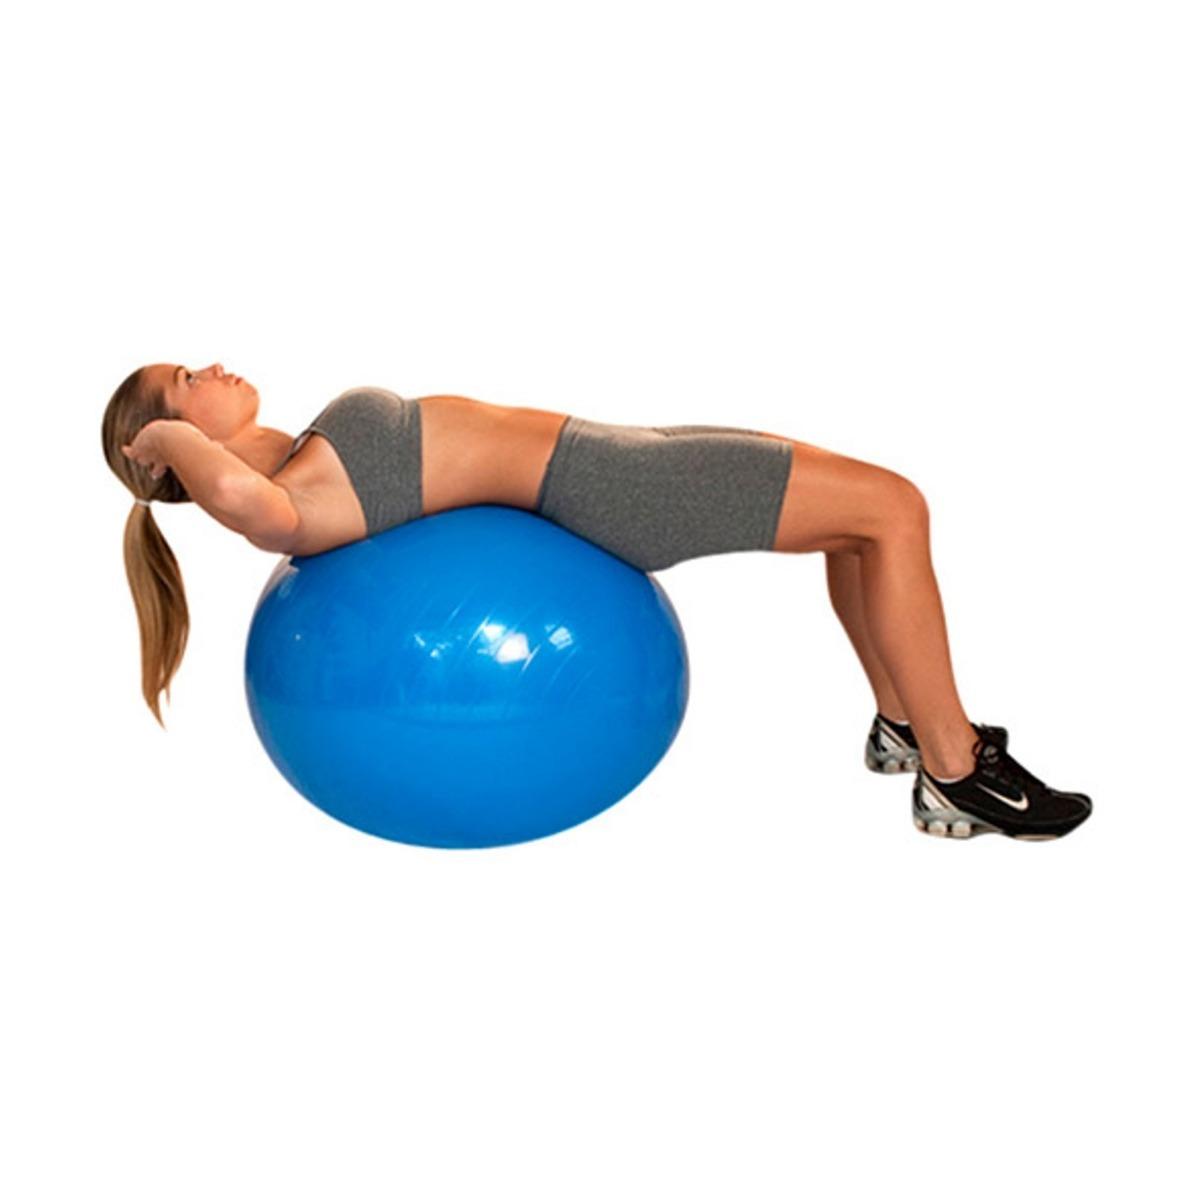 1268172bdc bola academia 65cm abdominal alongamento boa postura + bomba. Carregando  zoom.